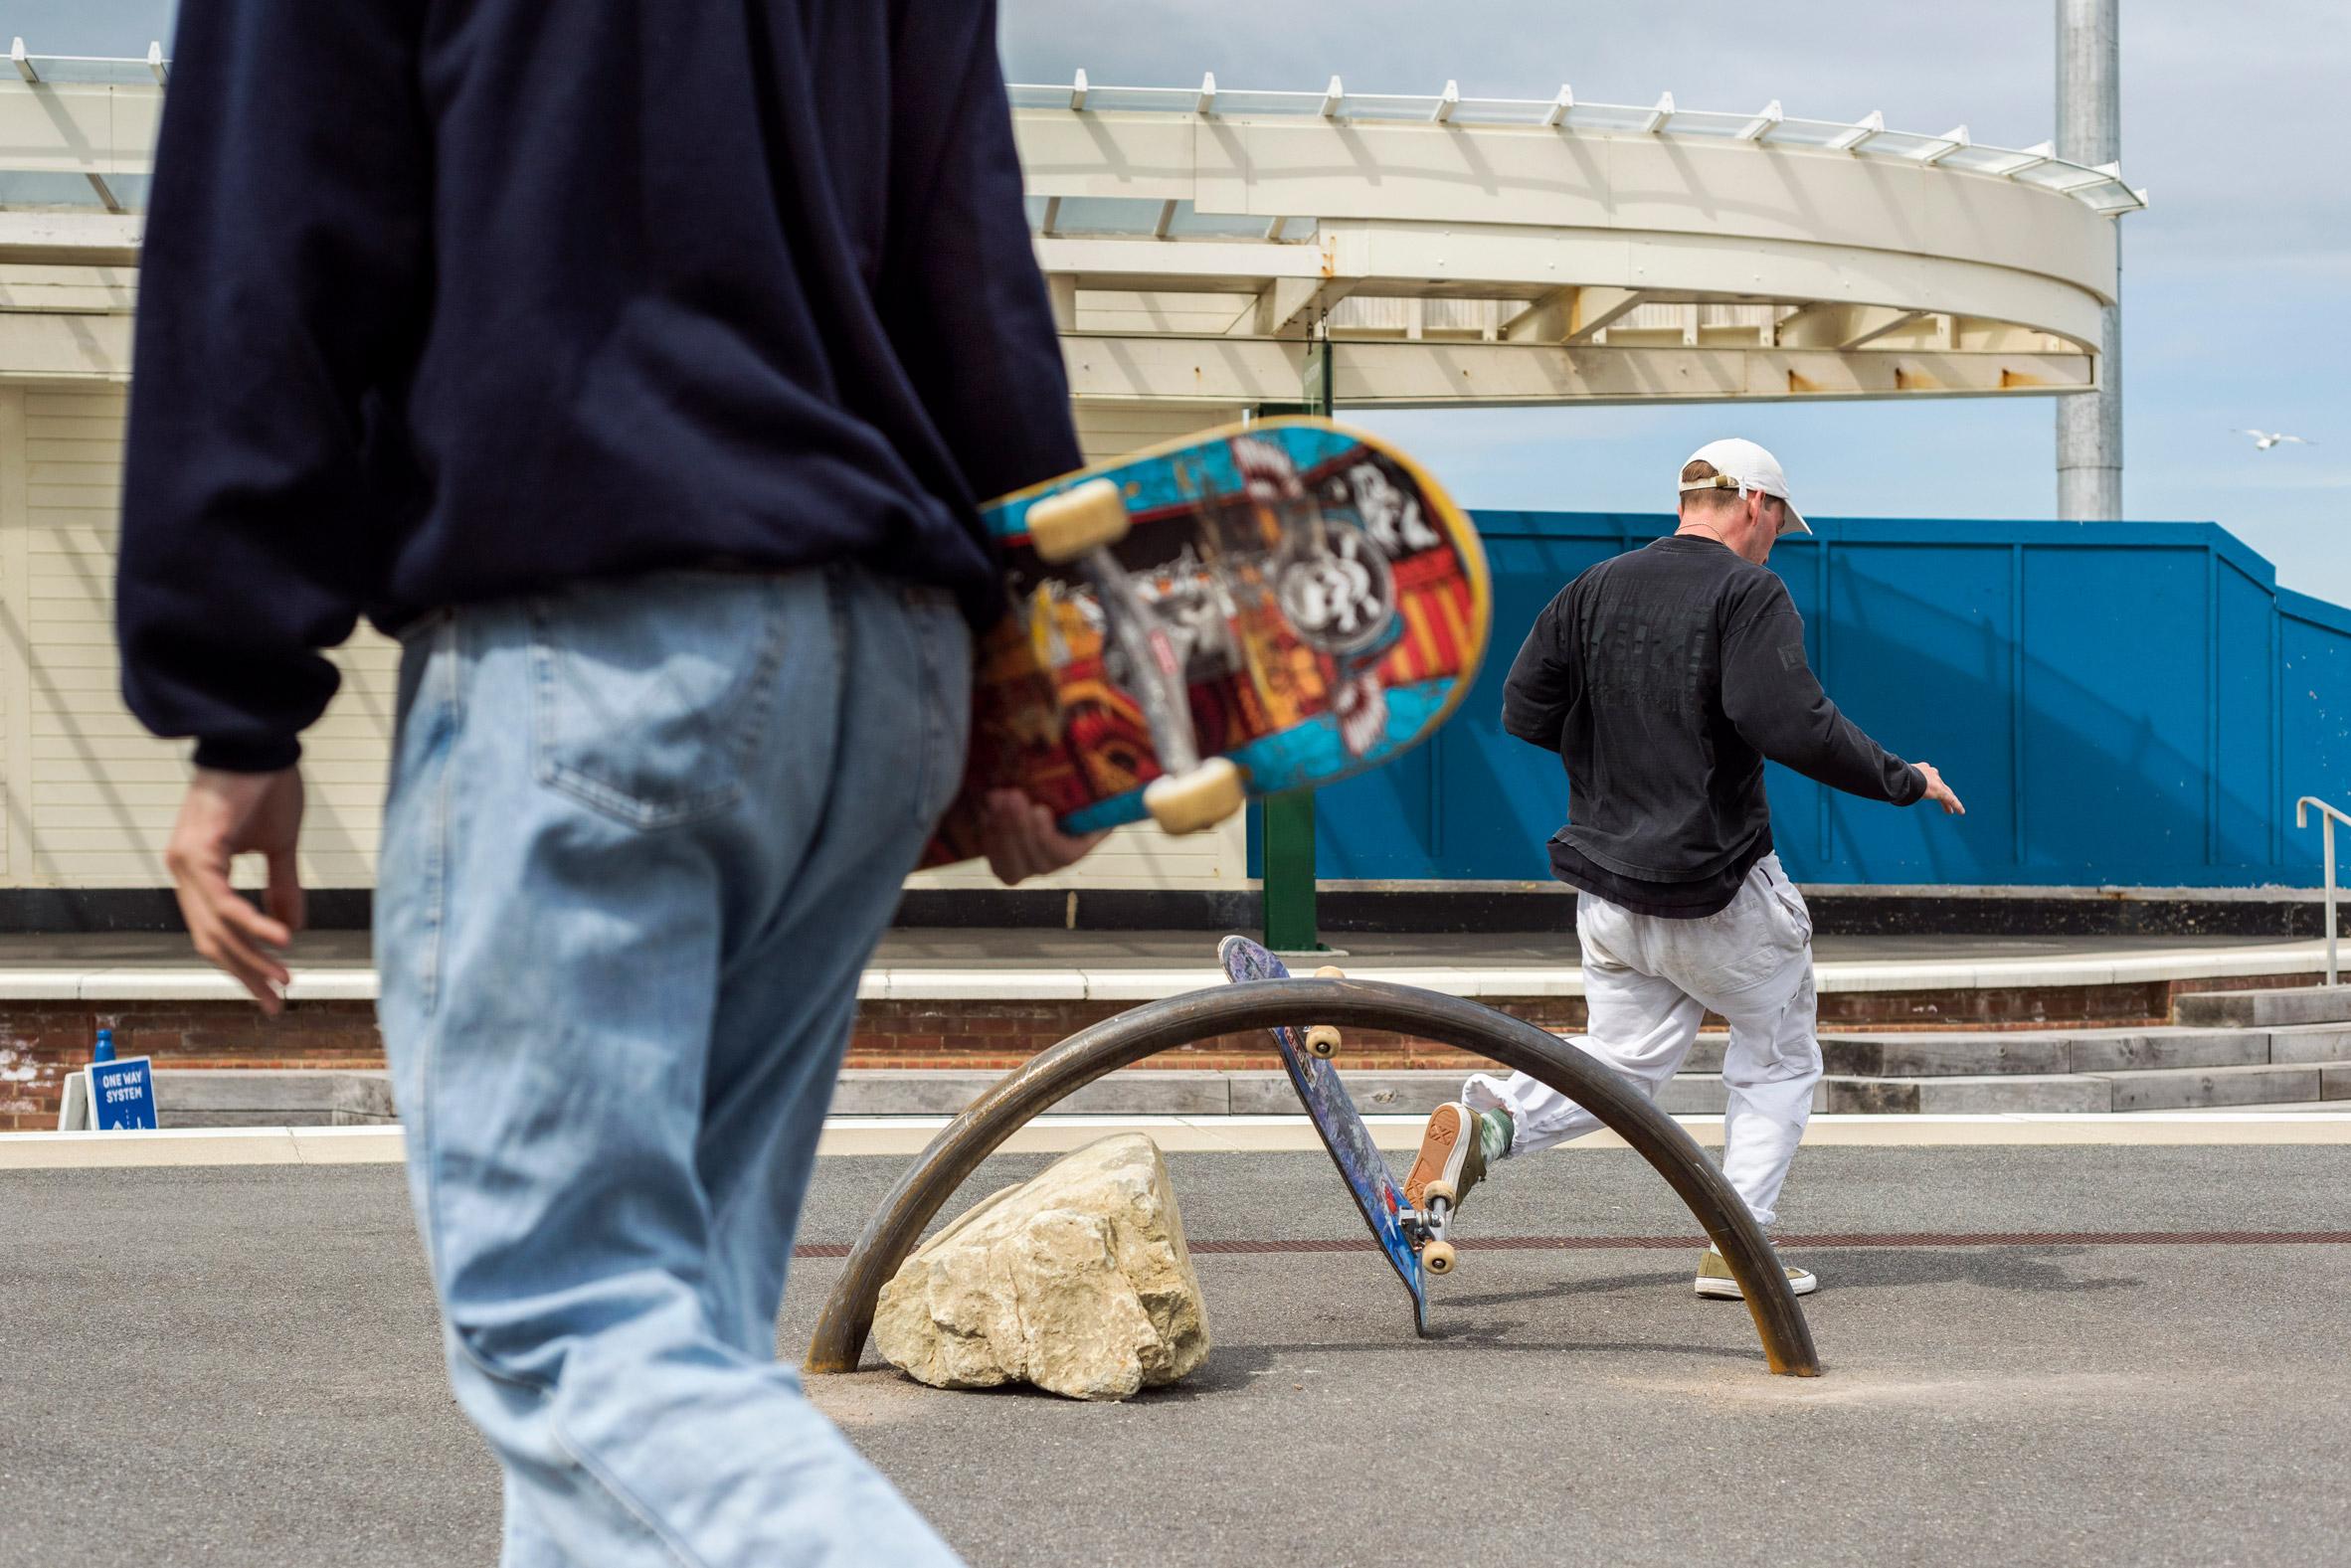 Skaters using Assemble's skatable sculptures at Folkestone Triennial 2021